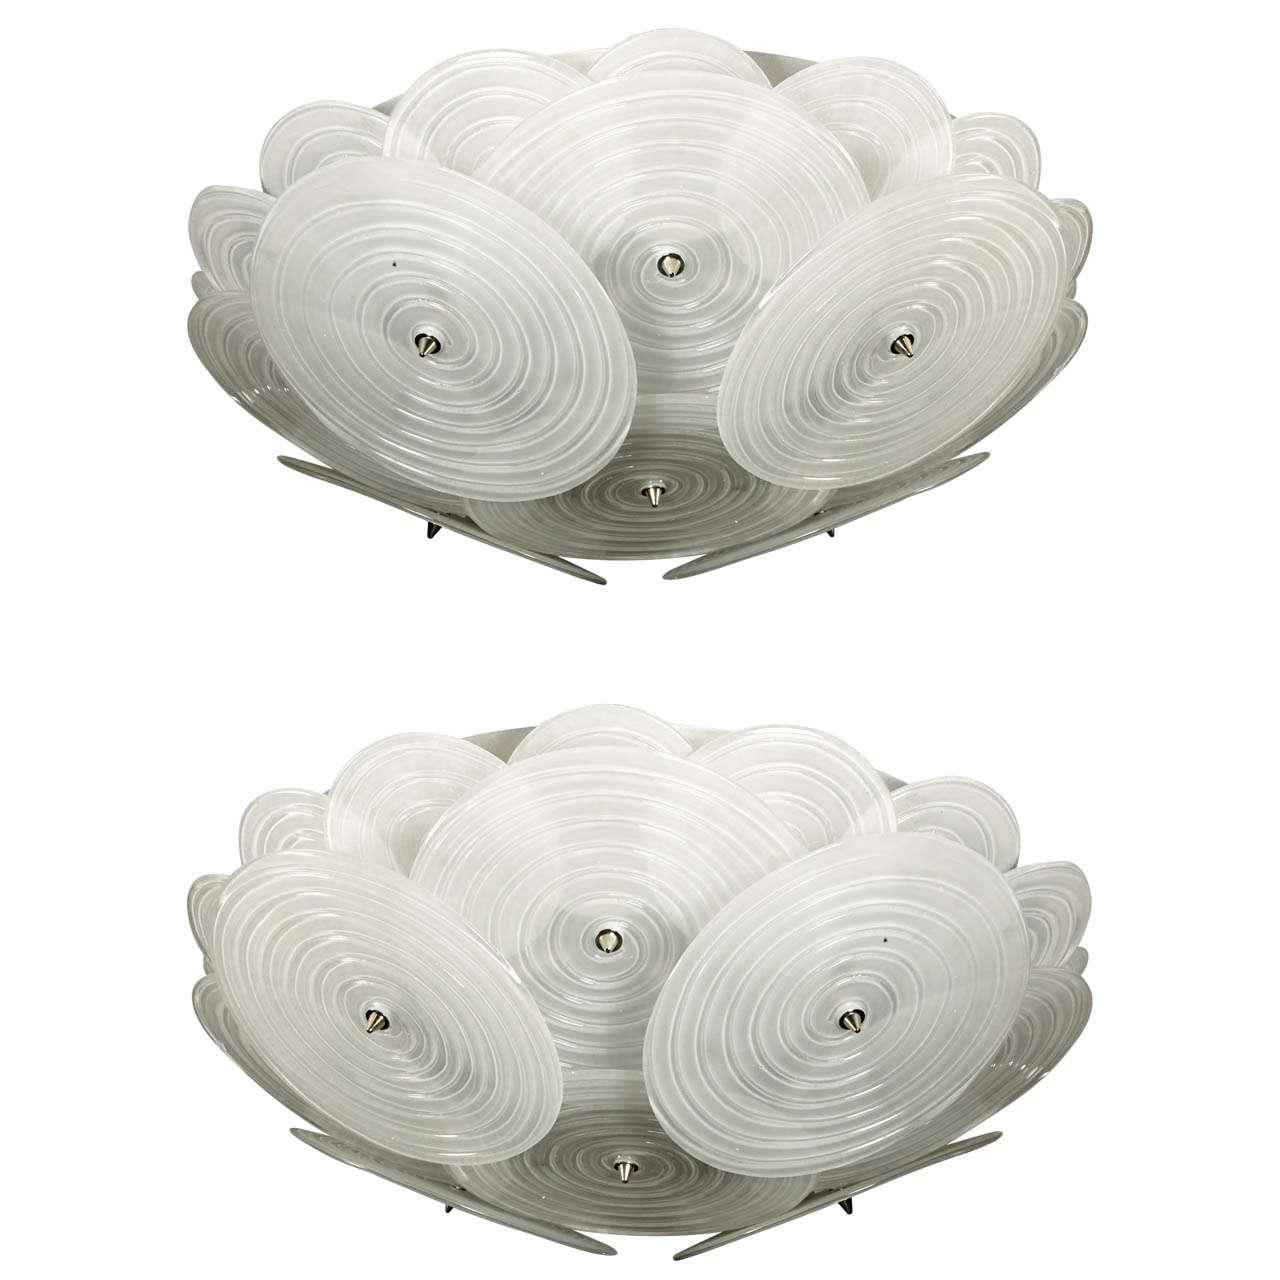 Original Pair Of Murano Glass Ceiling Chandeliers